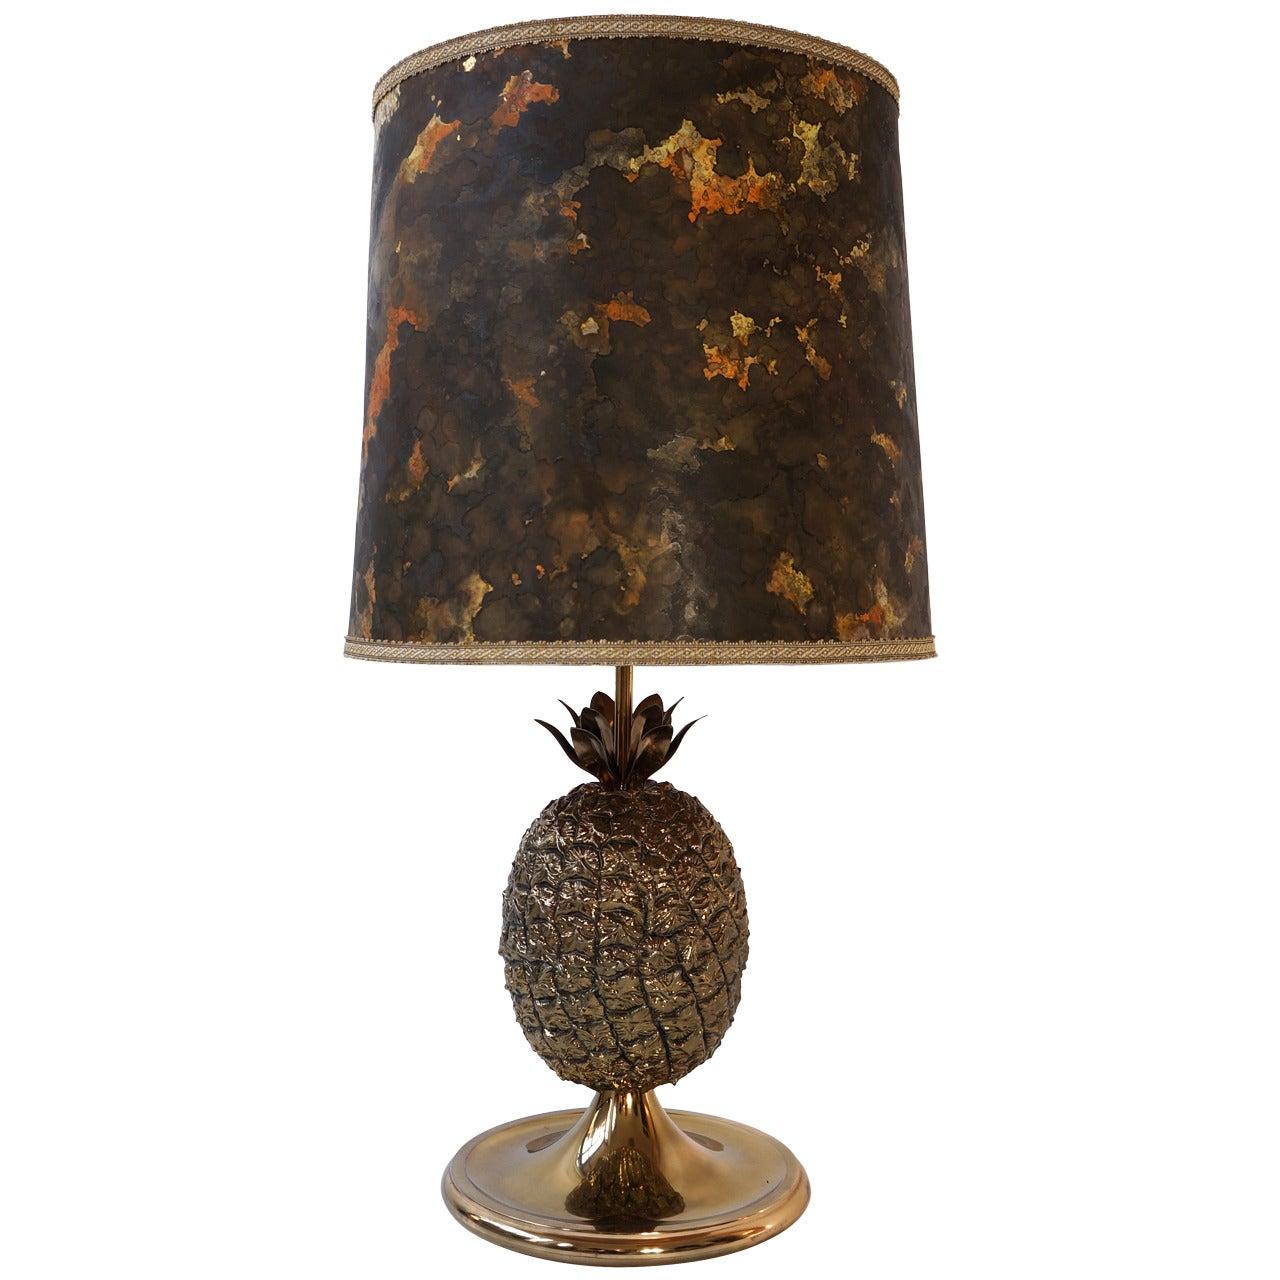 Hollywood Regency Pineapple Table Lamp, France, 1960s